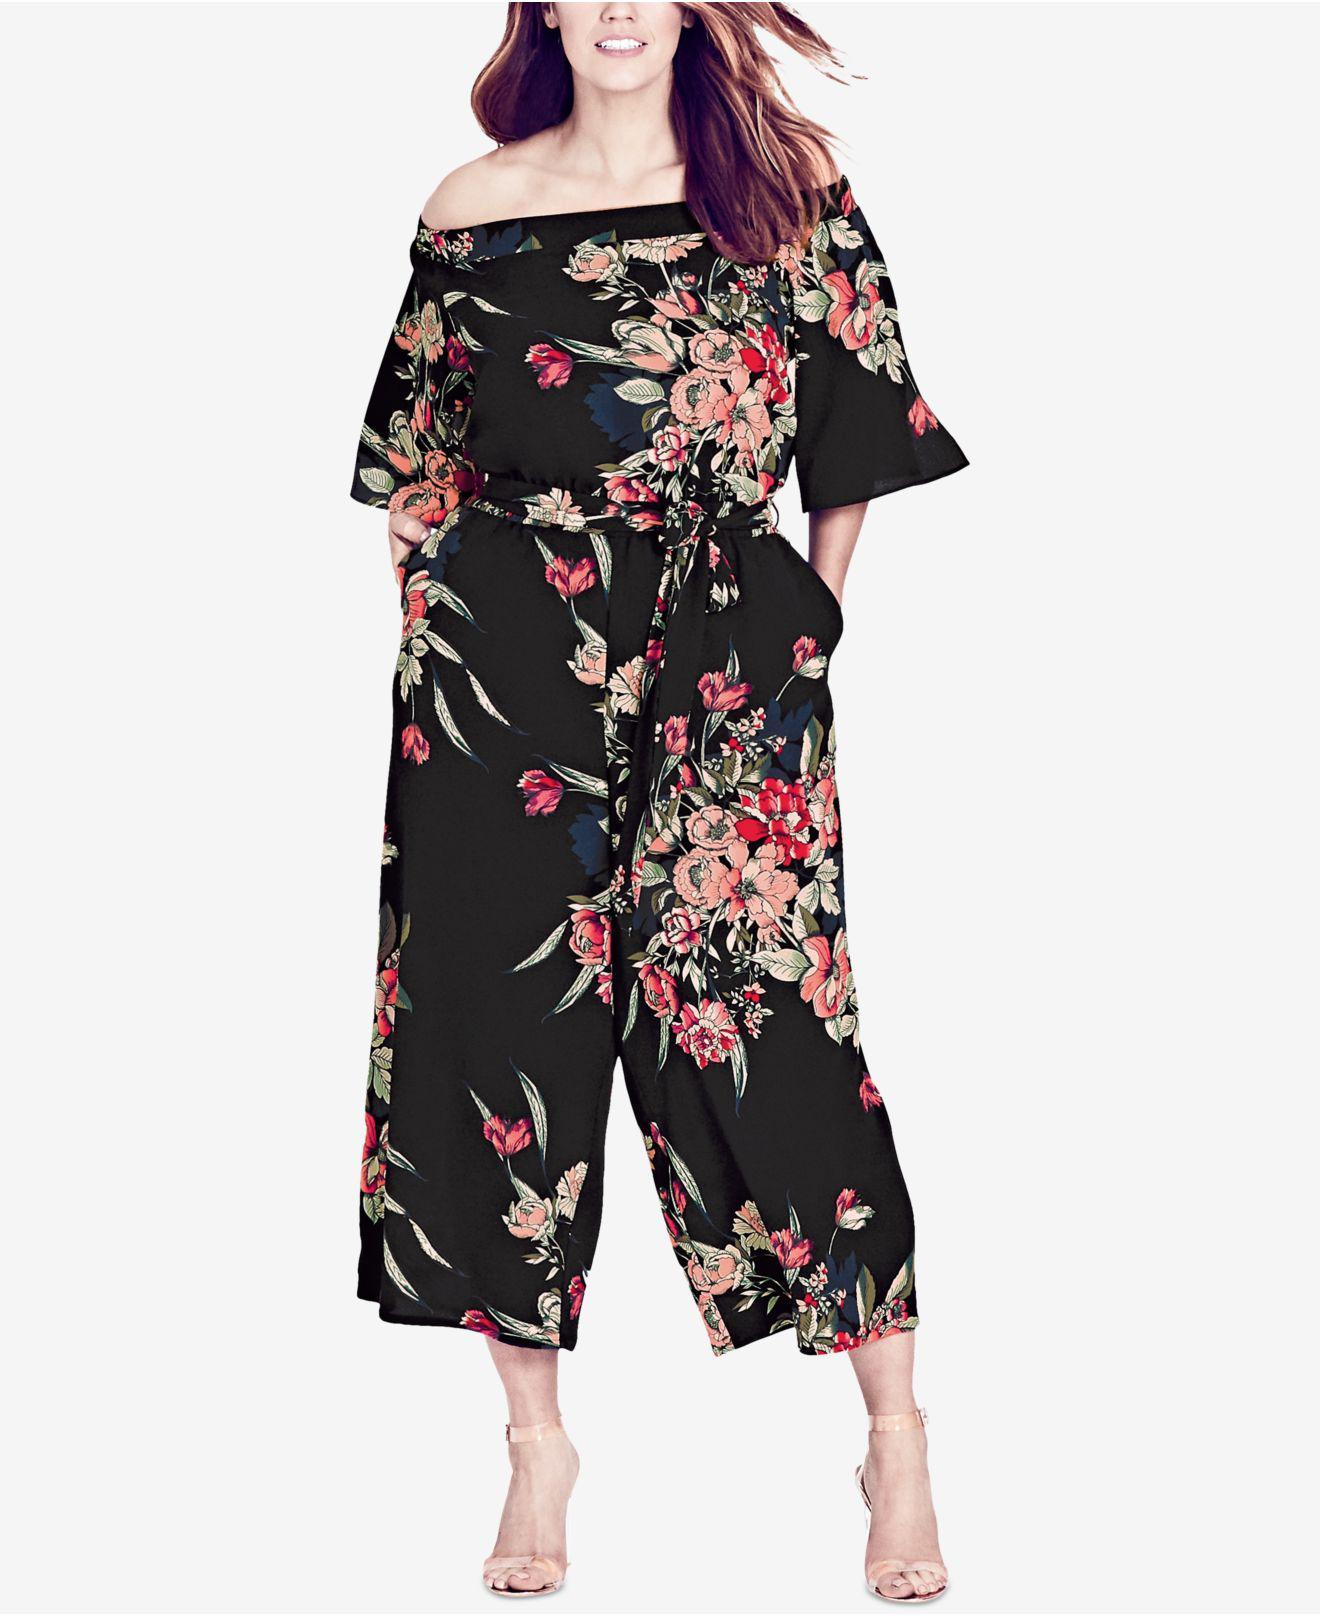 ff4f24f54fc2d City Chic Trendy Plus Size Off-the-shoulder Jumpsuit in Black - Save ...